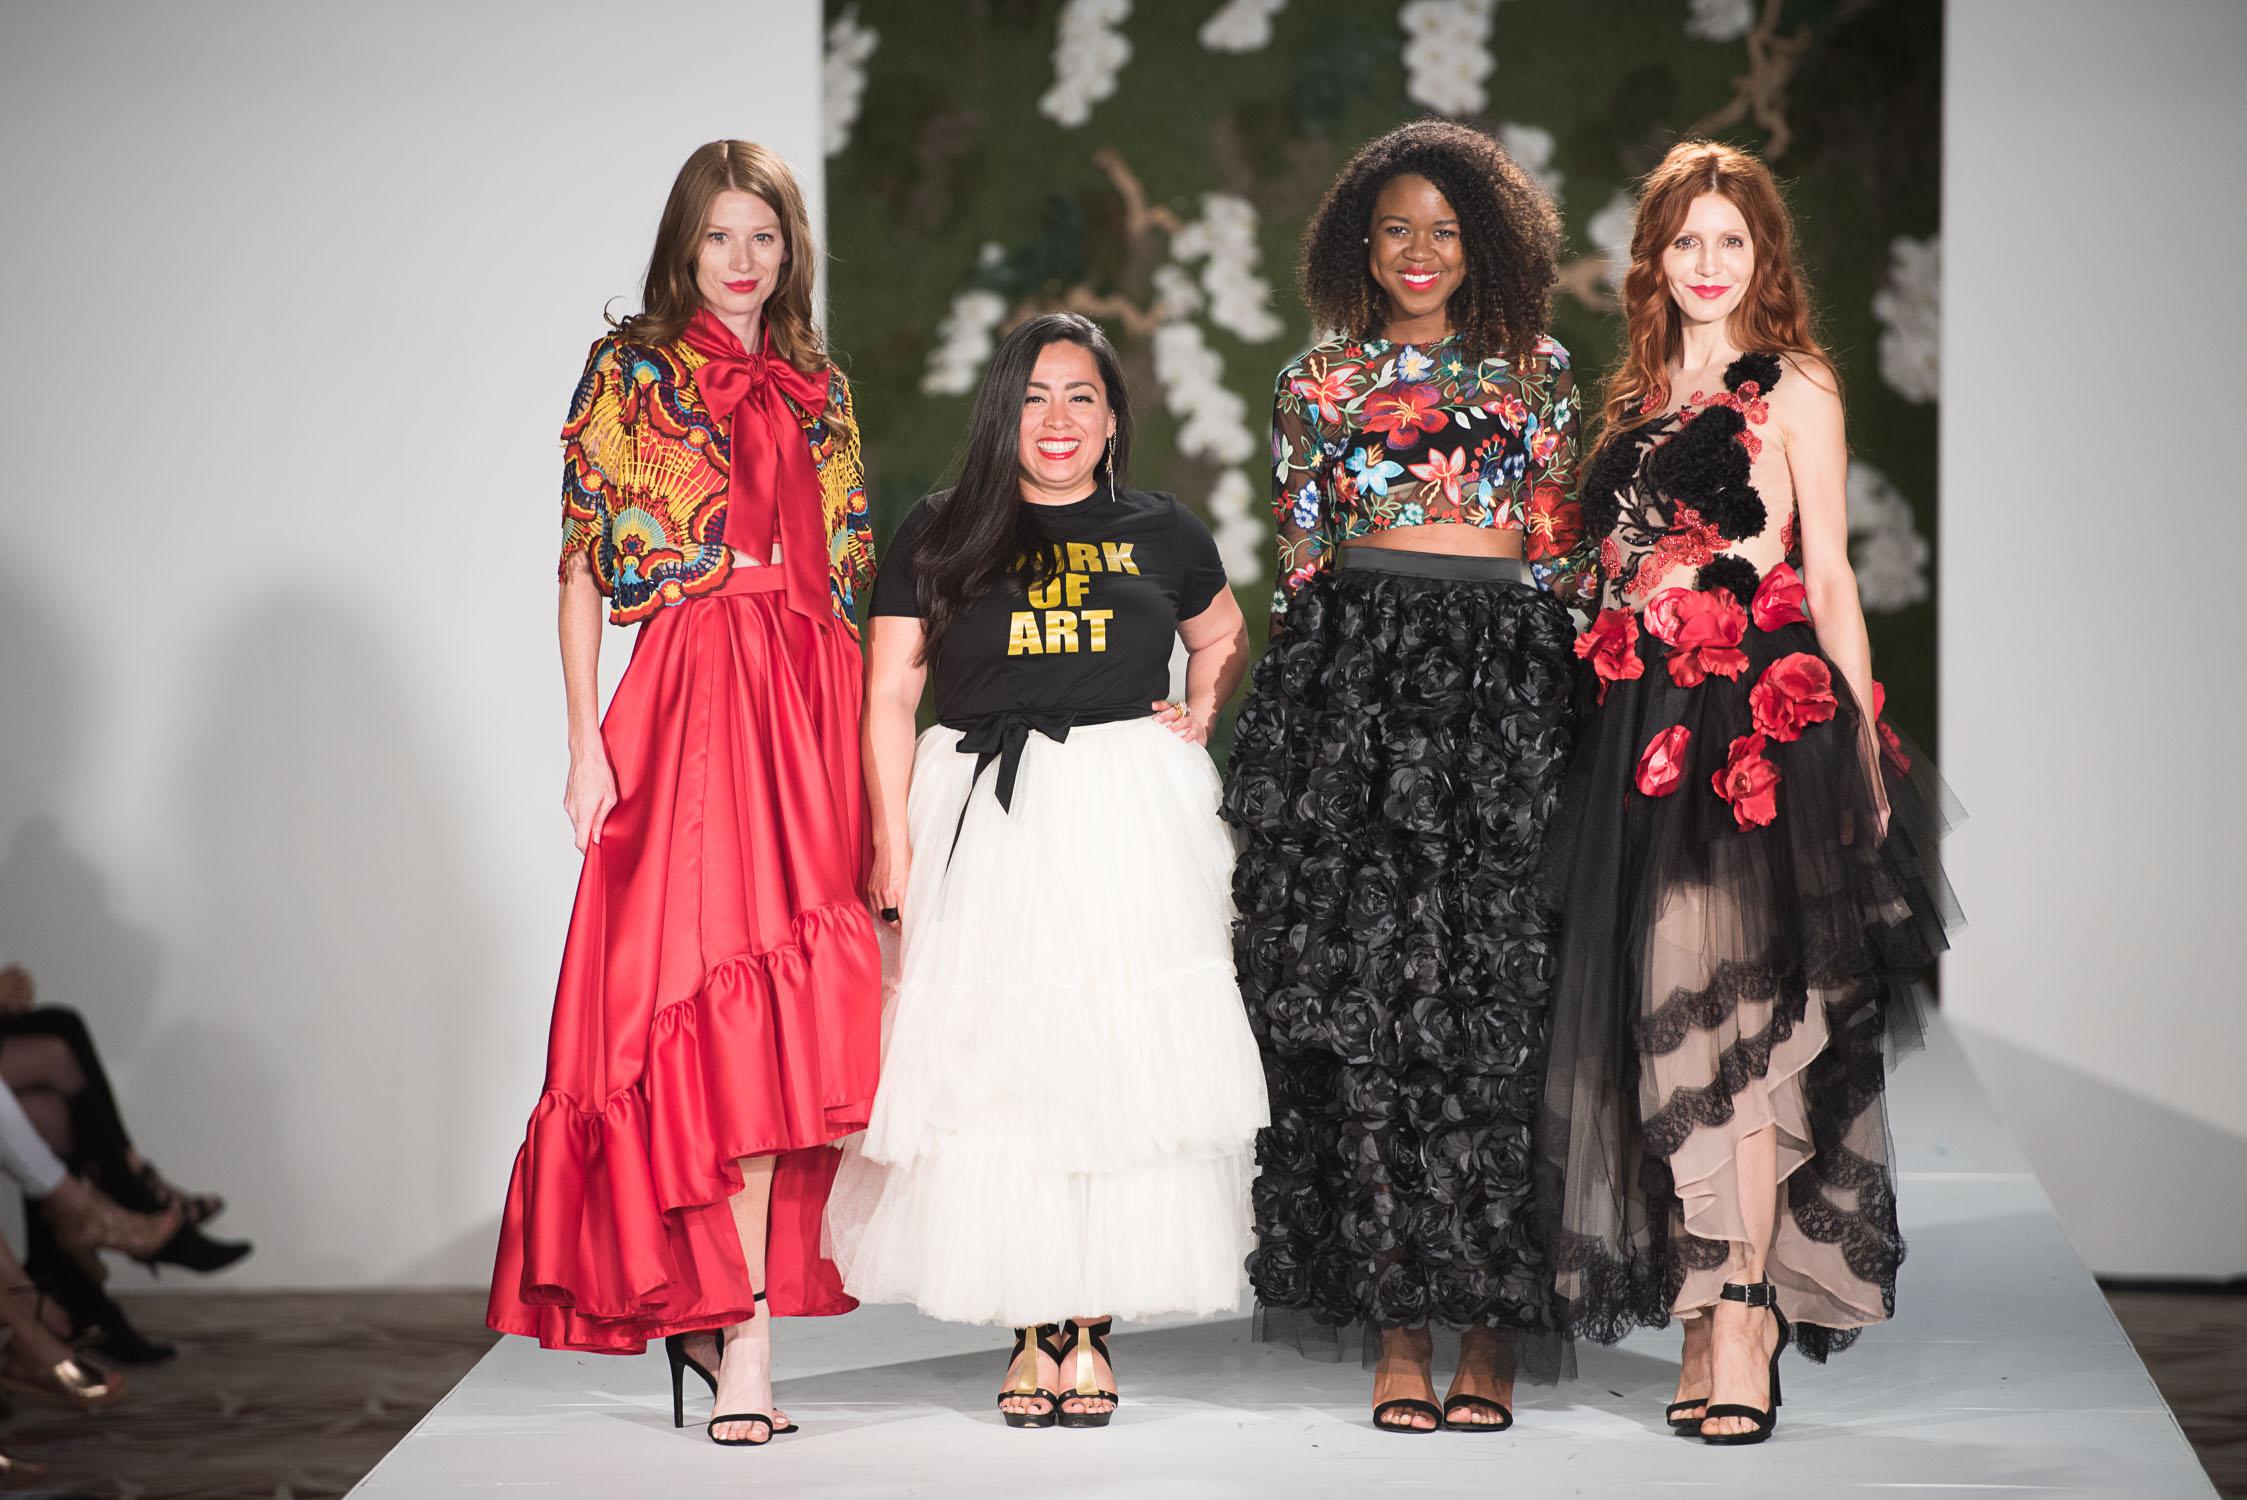 Fashion X Austin Fashion Week 2017 Mira Visu Photography with Luna Elise-658.JPG